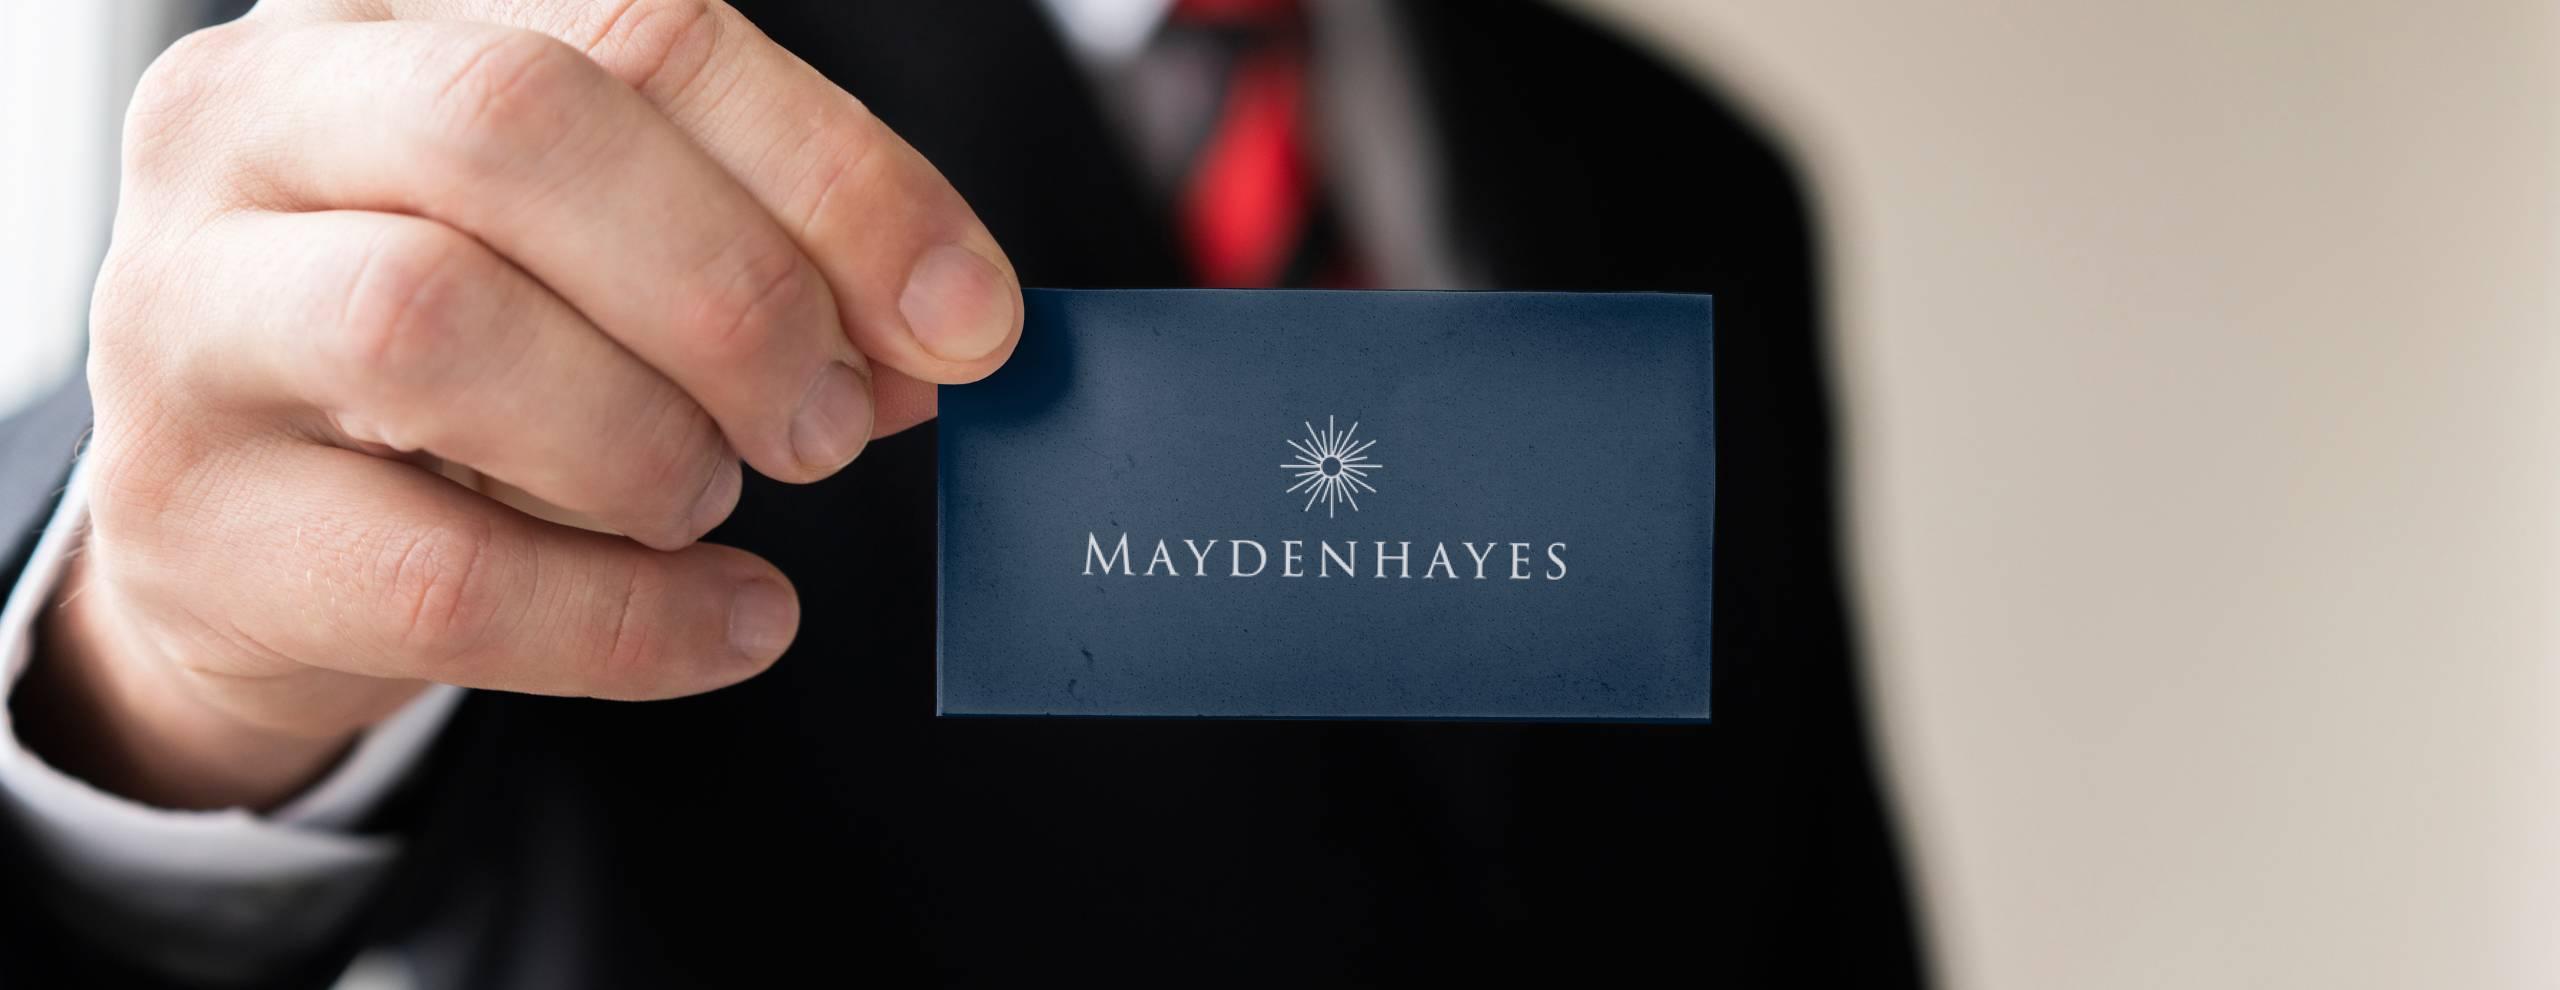 mayden-8-scaled-1